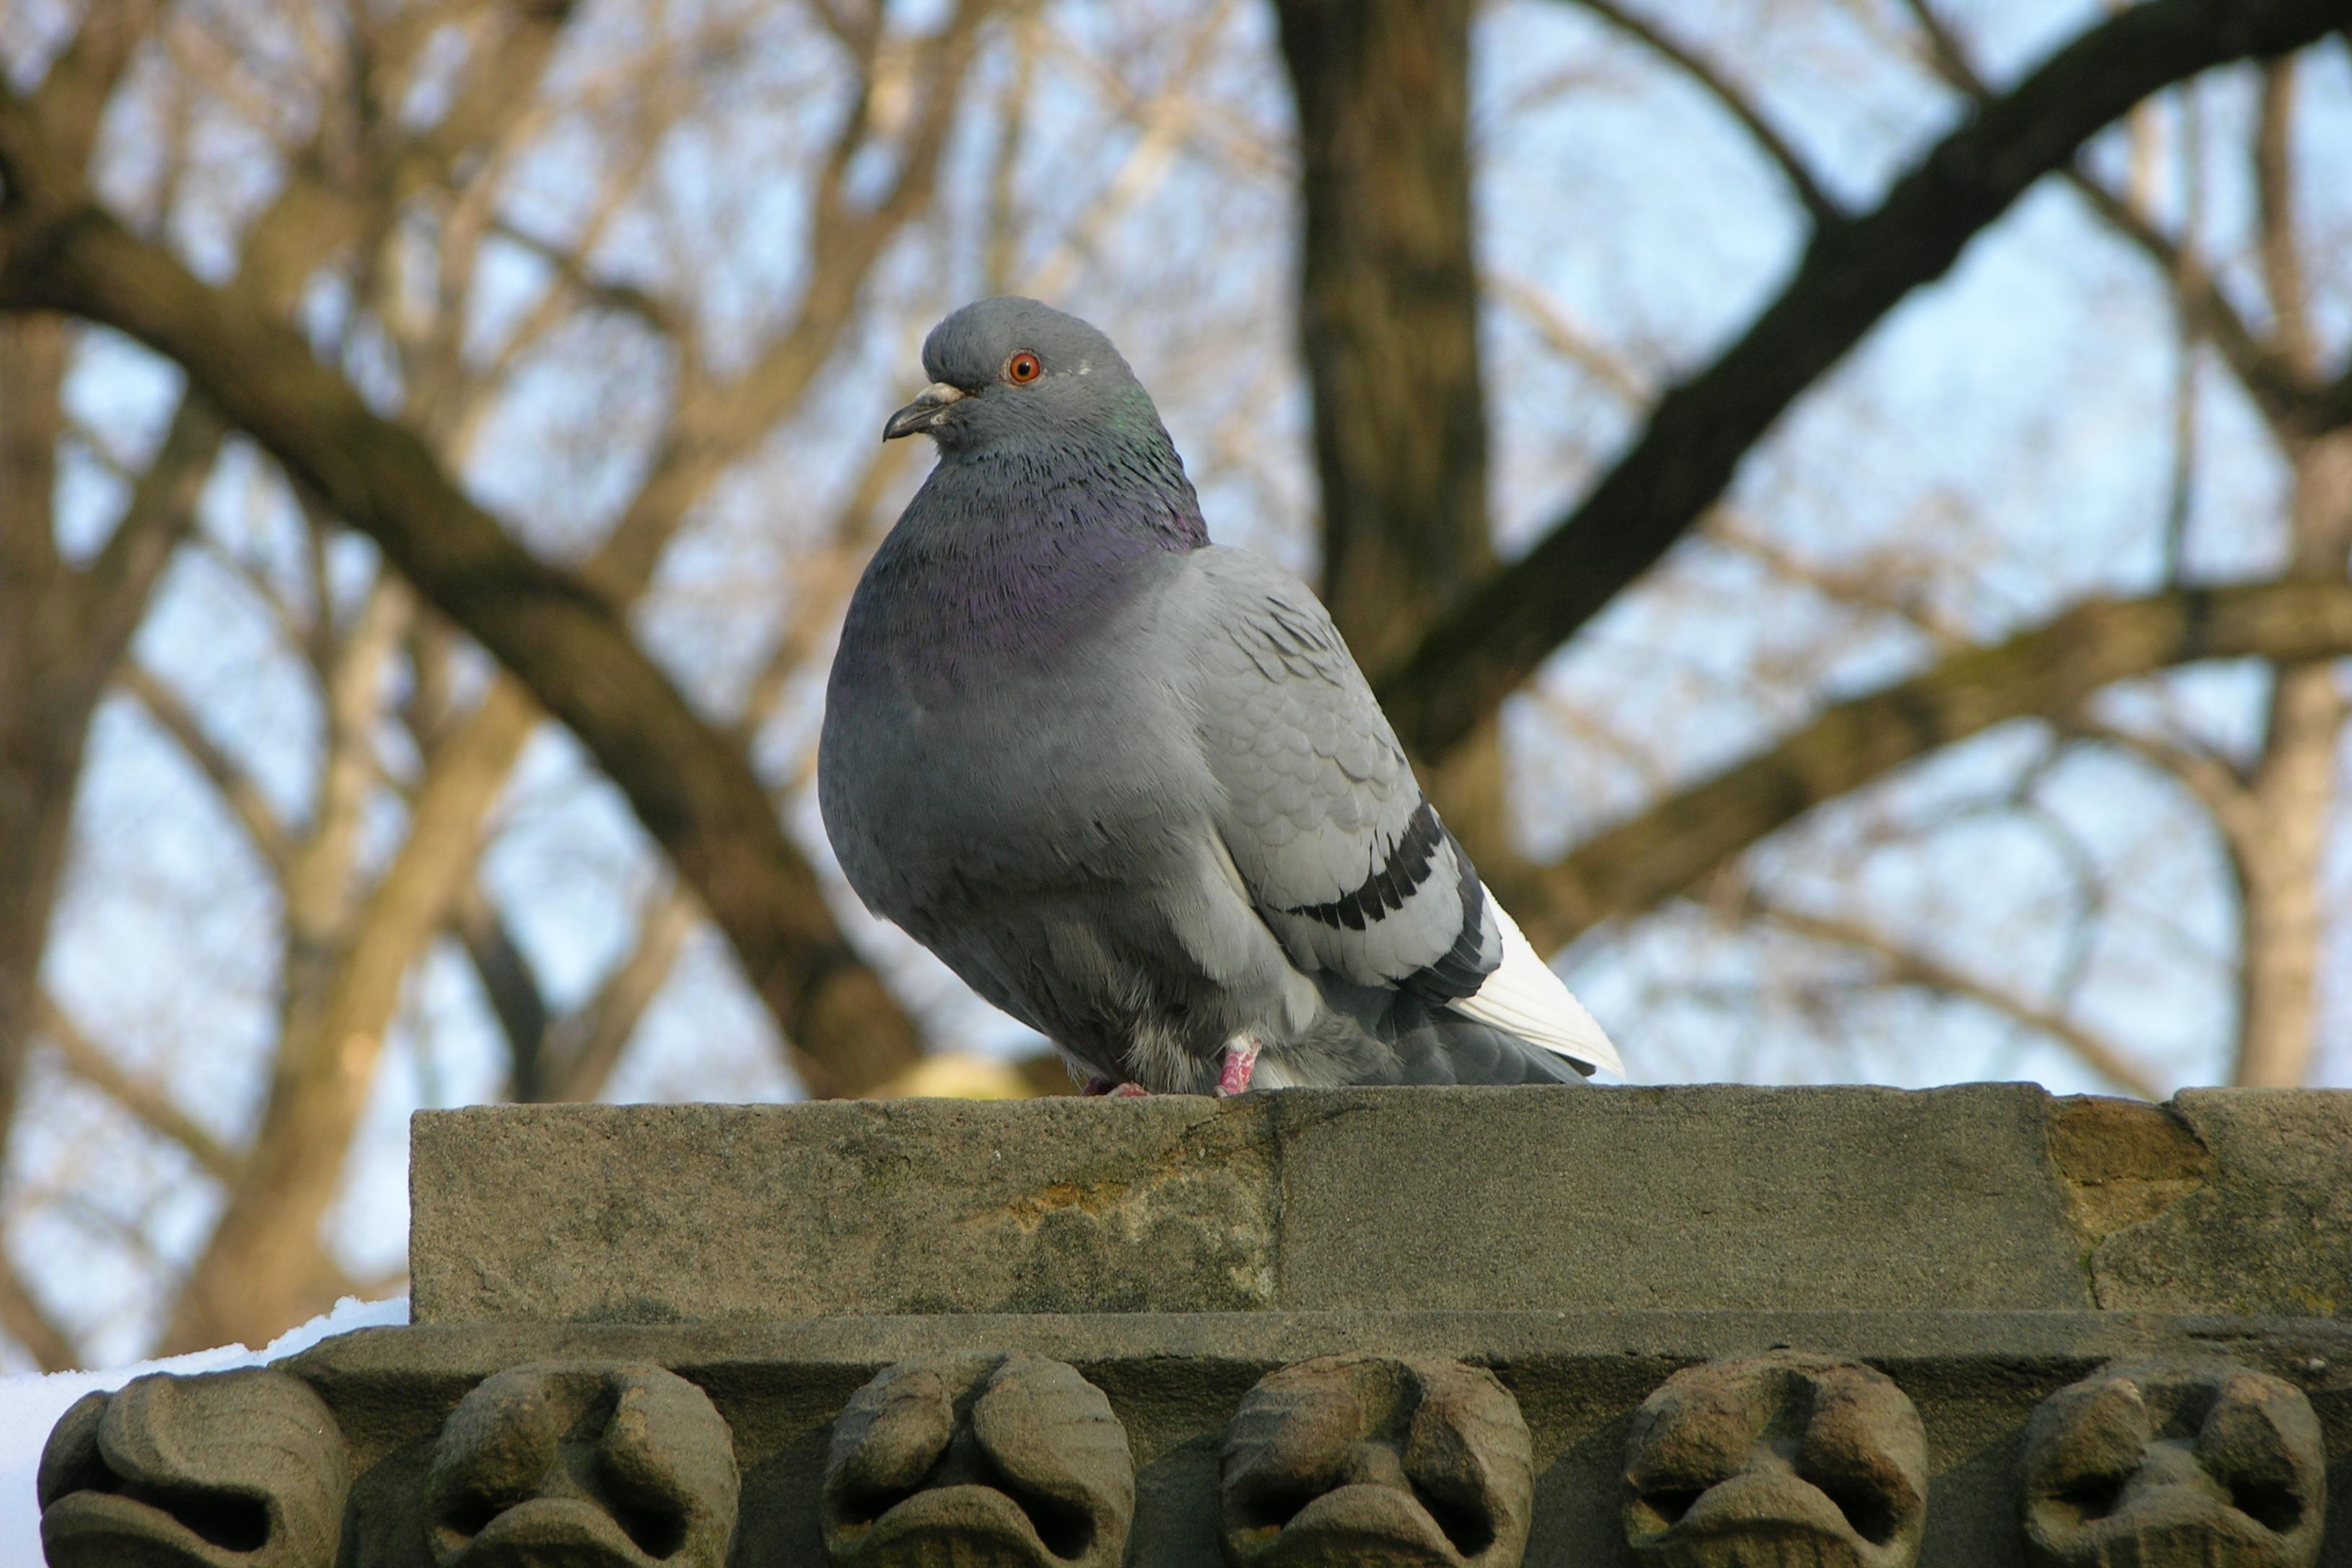 Rock_Pigeon_Columba_livia_3264px.jpg